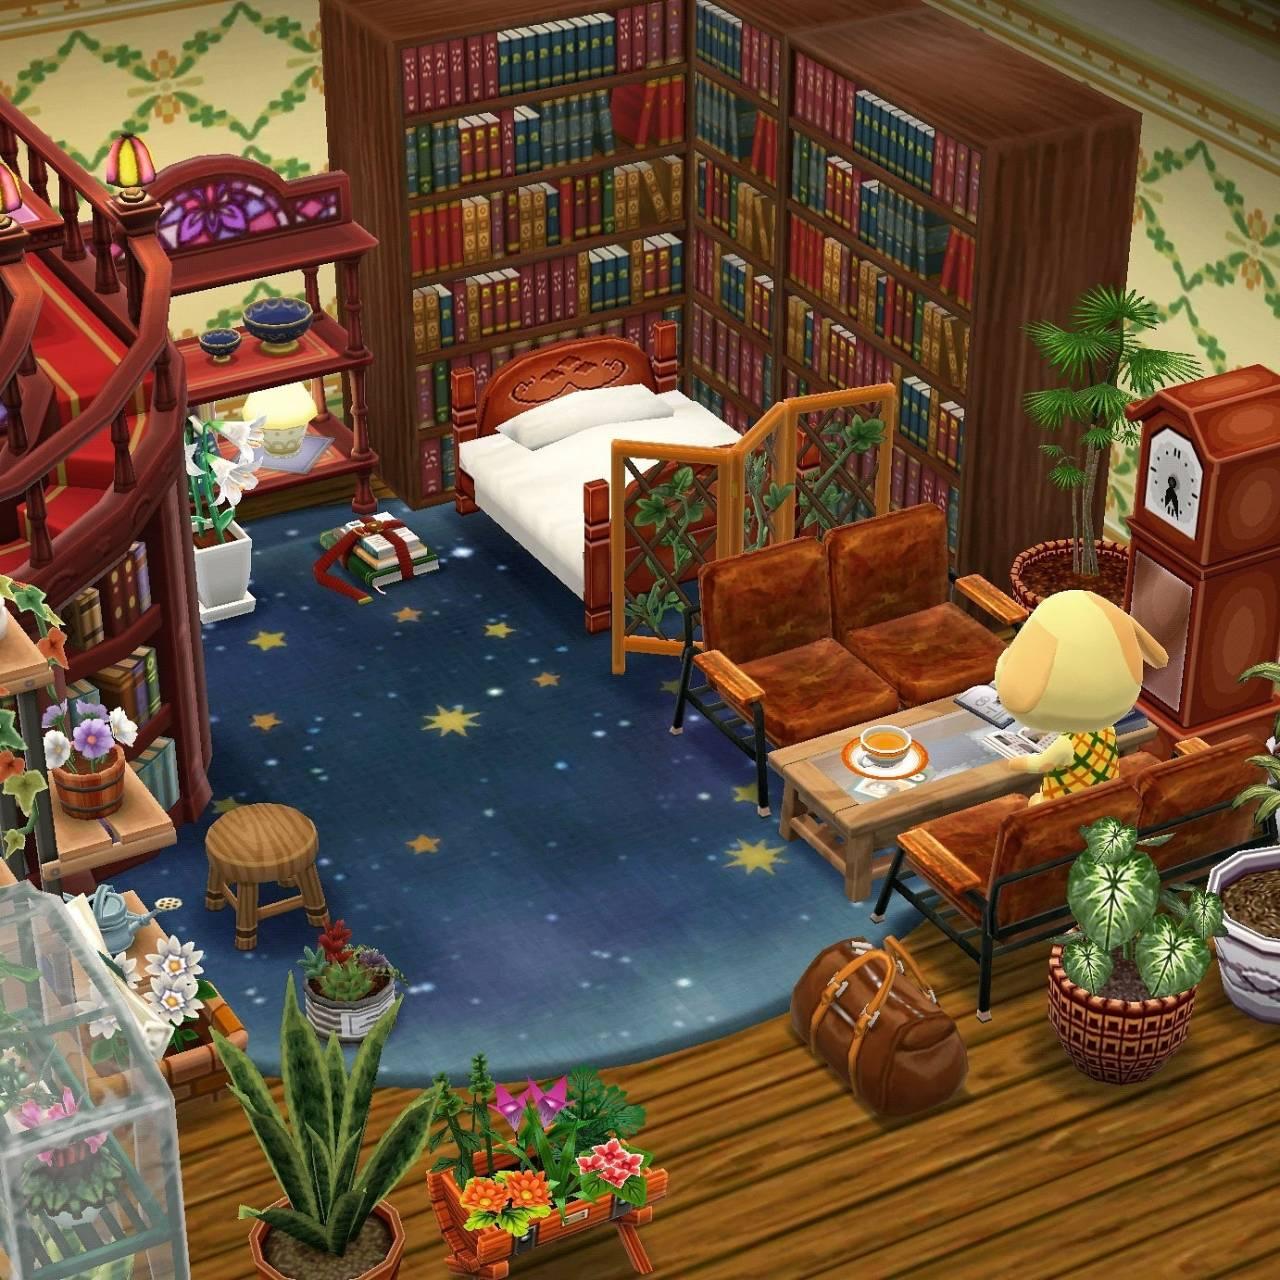 Animal Crossing Room Decoration Ideas